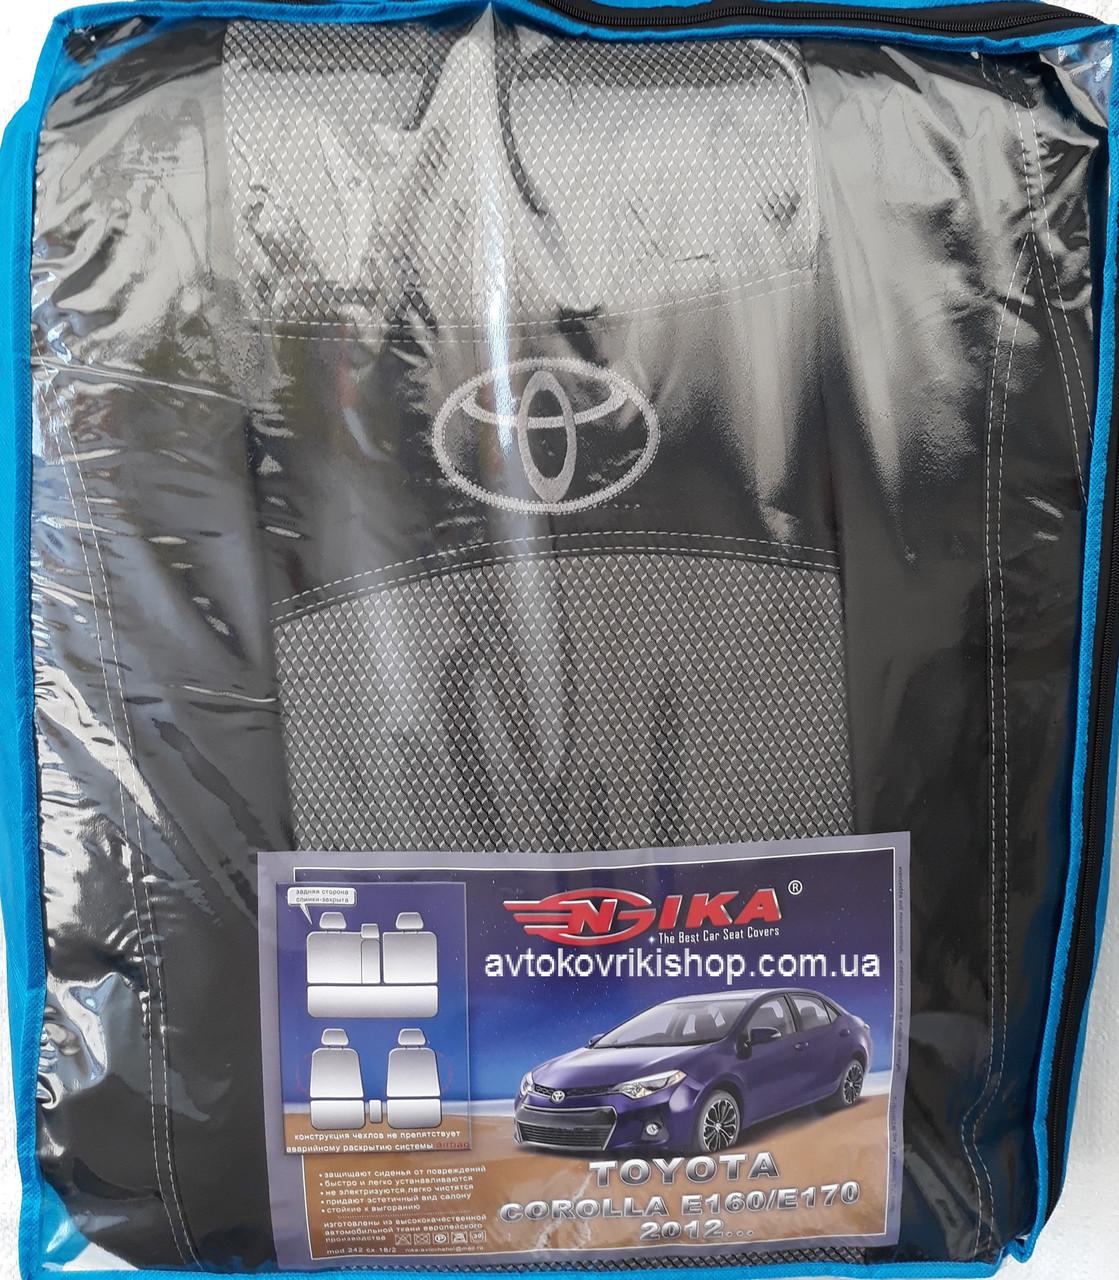 Авточехлы Toyota Corolla E160 / E170 2012- Nika